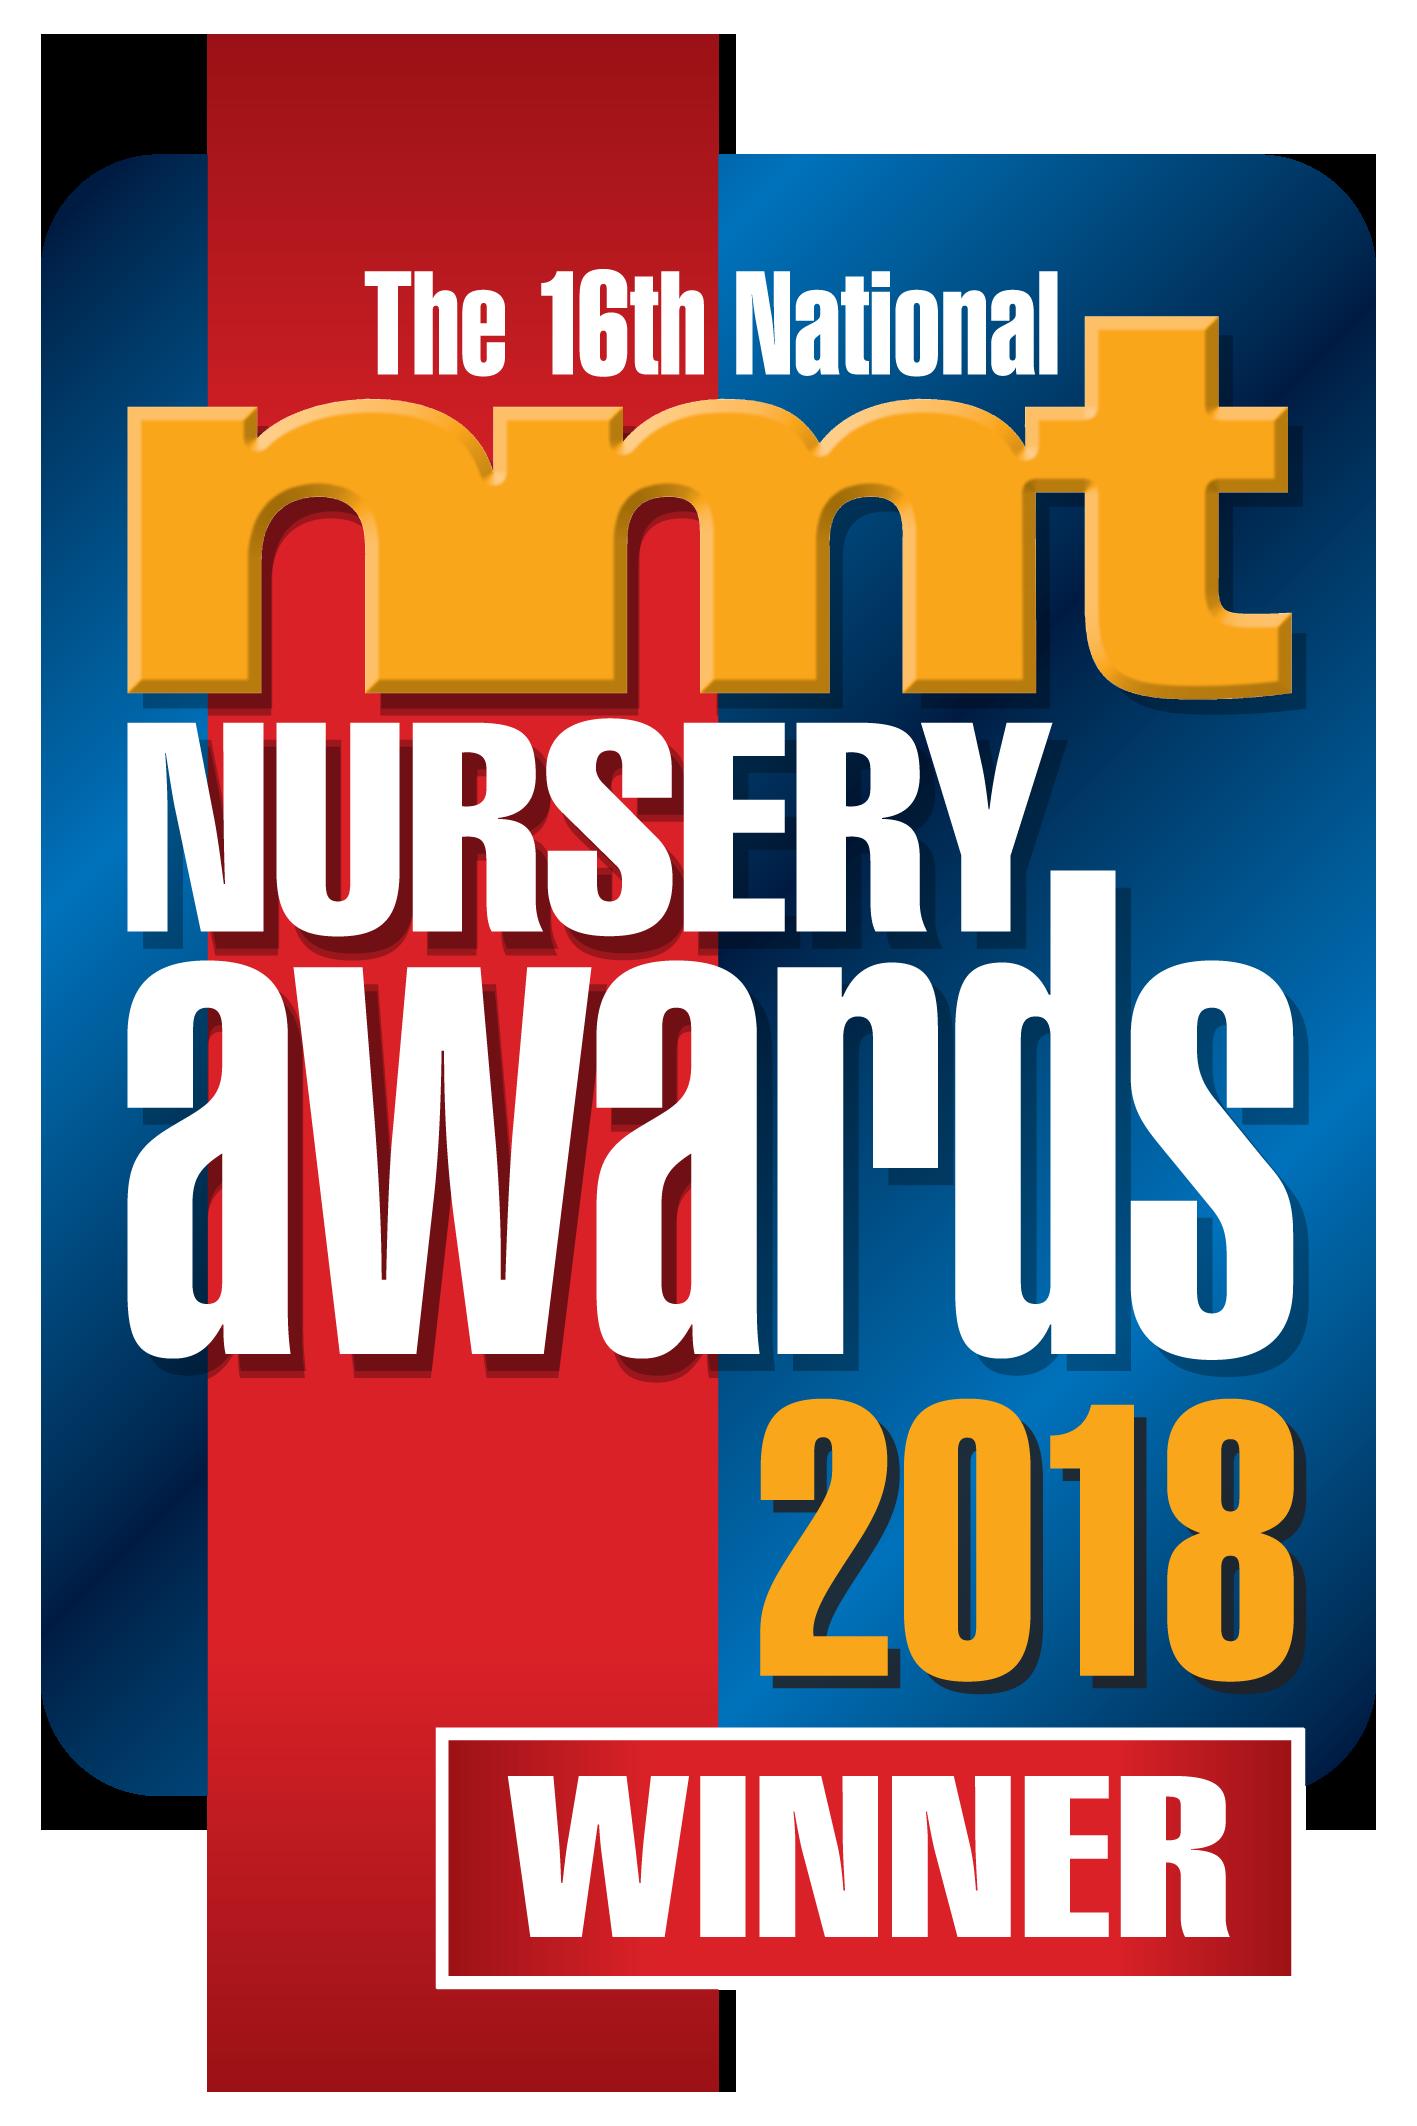 NMT Winner 2018 - Elmscot Group